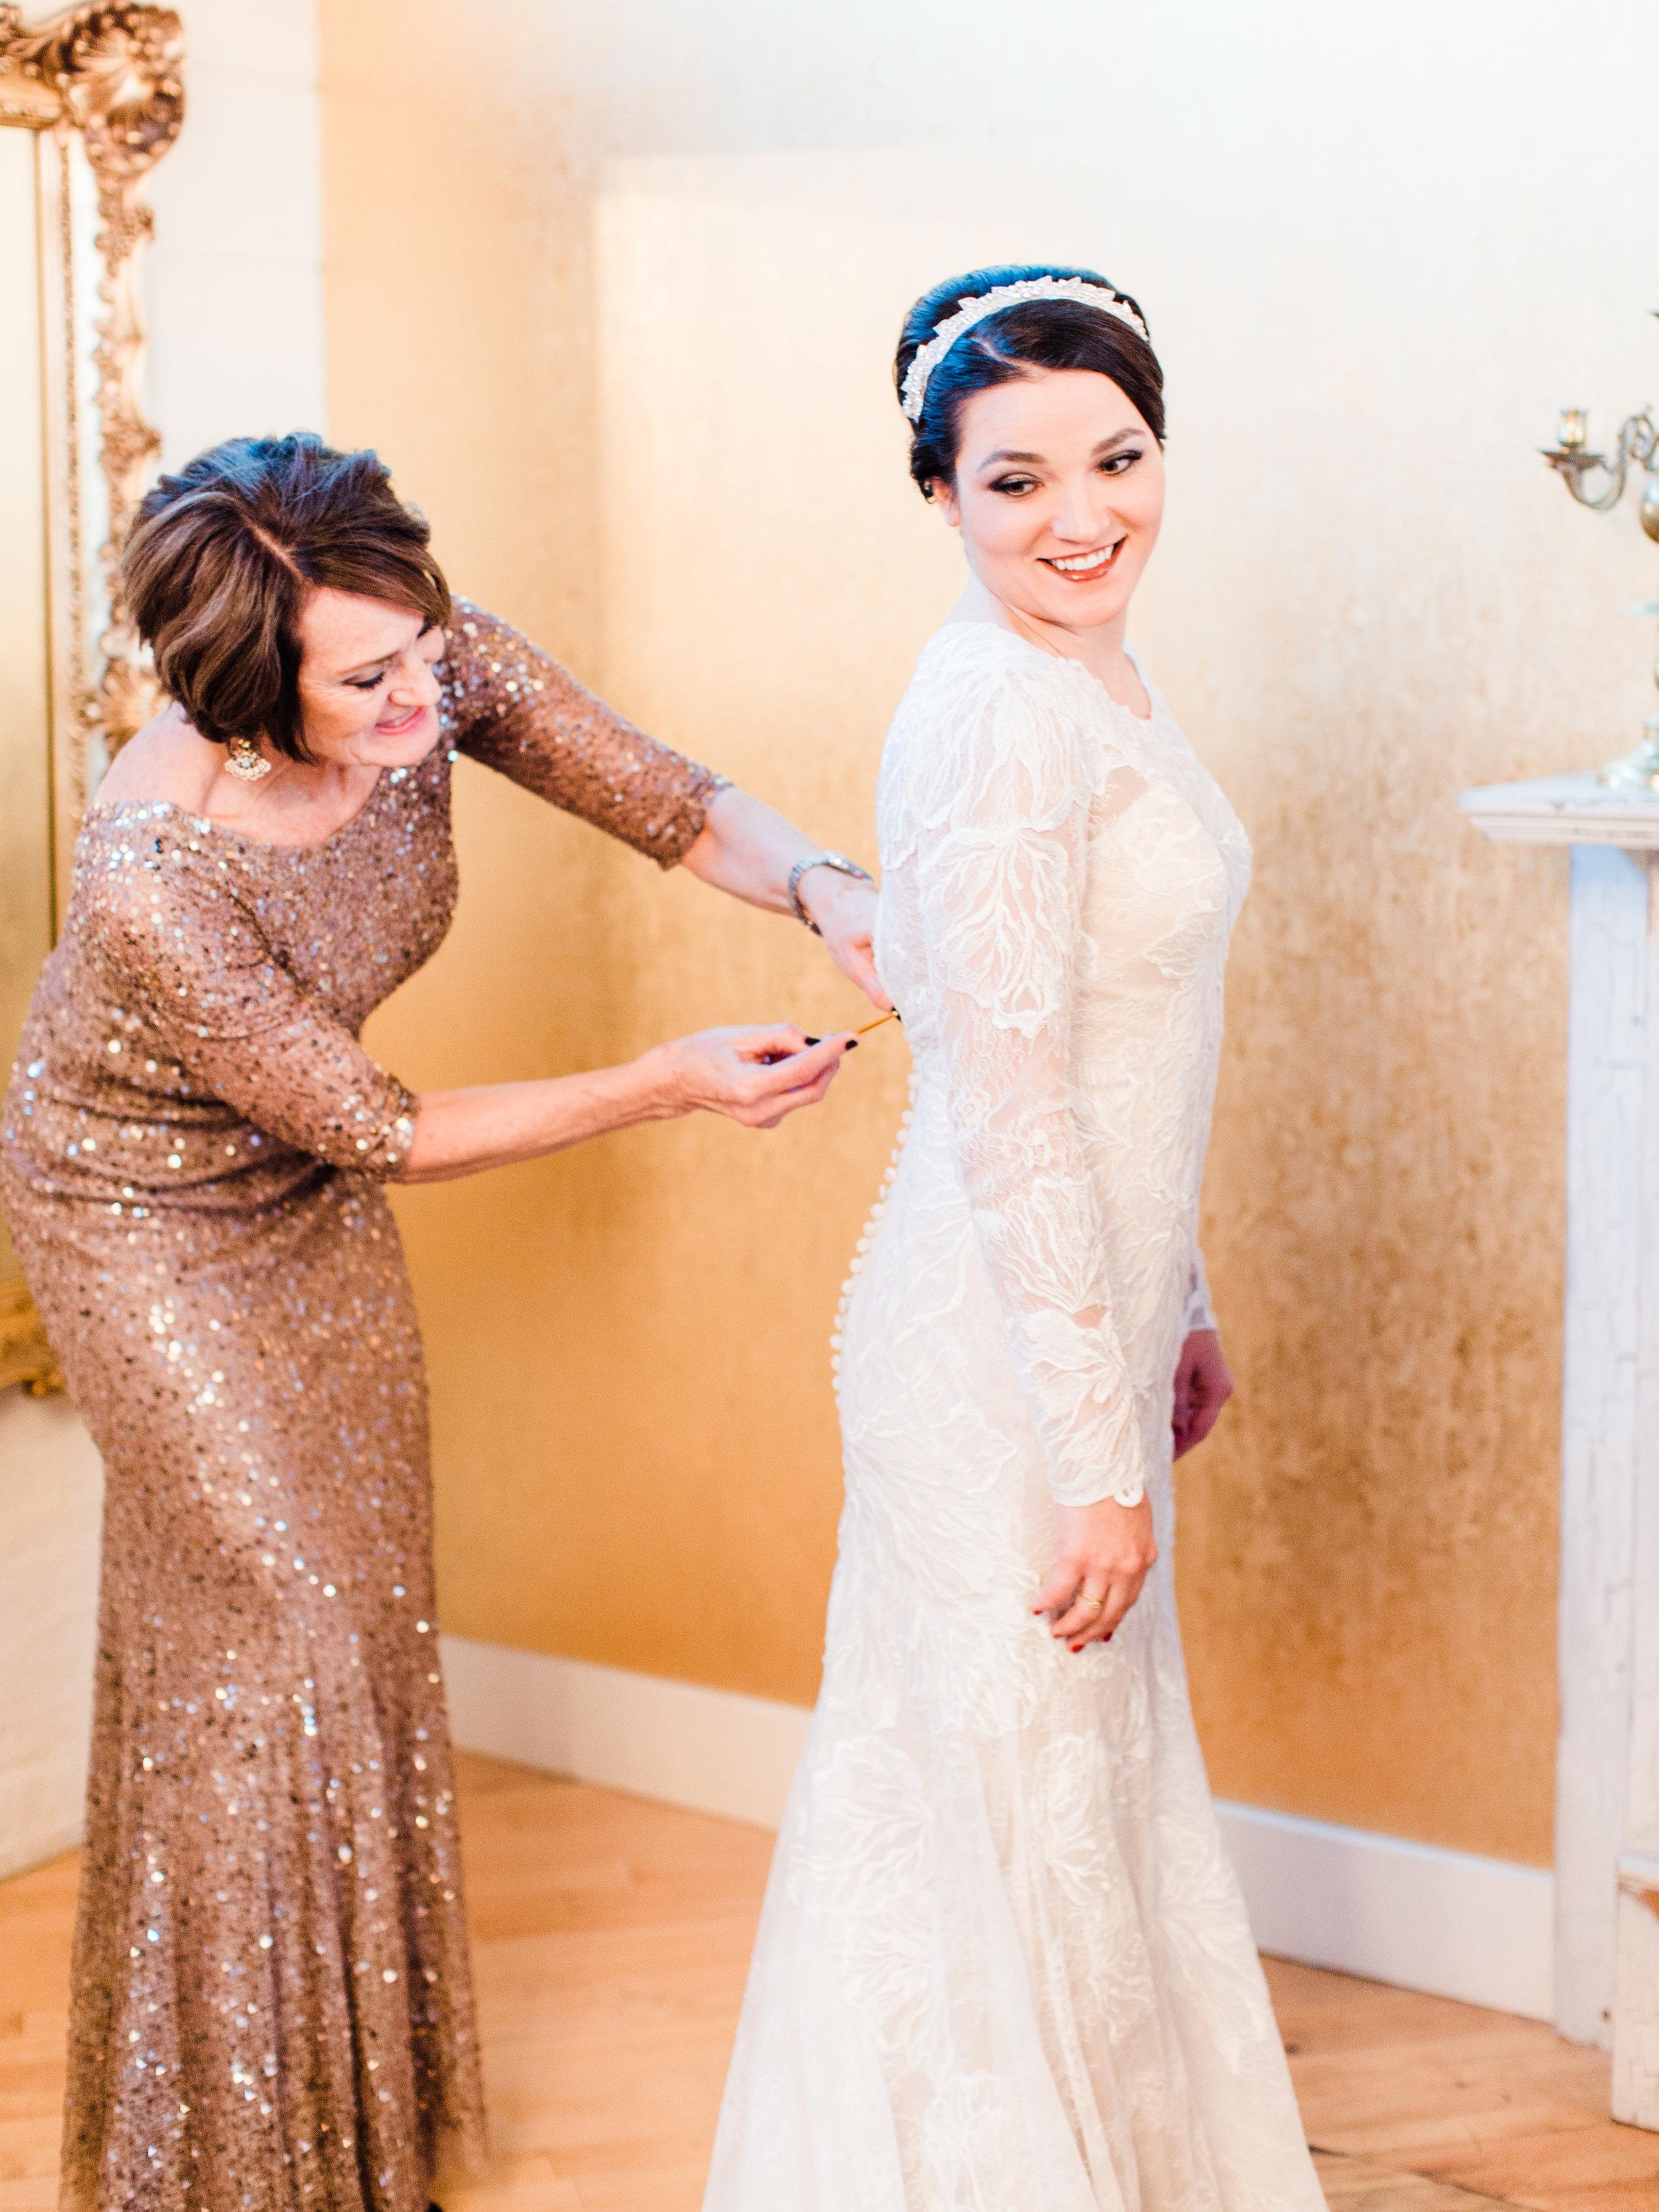 Vogelzang+Wedding+Getting+Ready-85.jpg